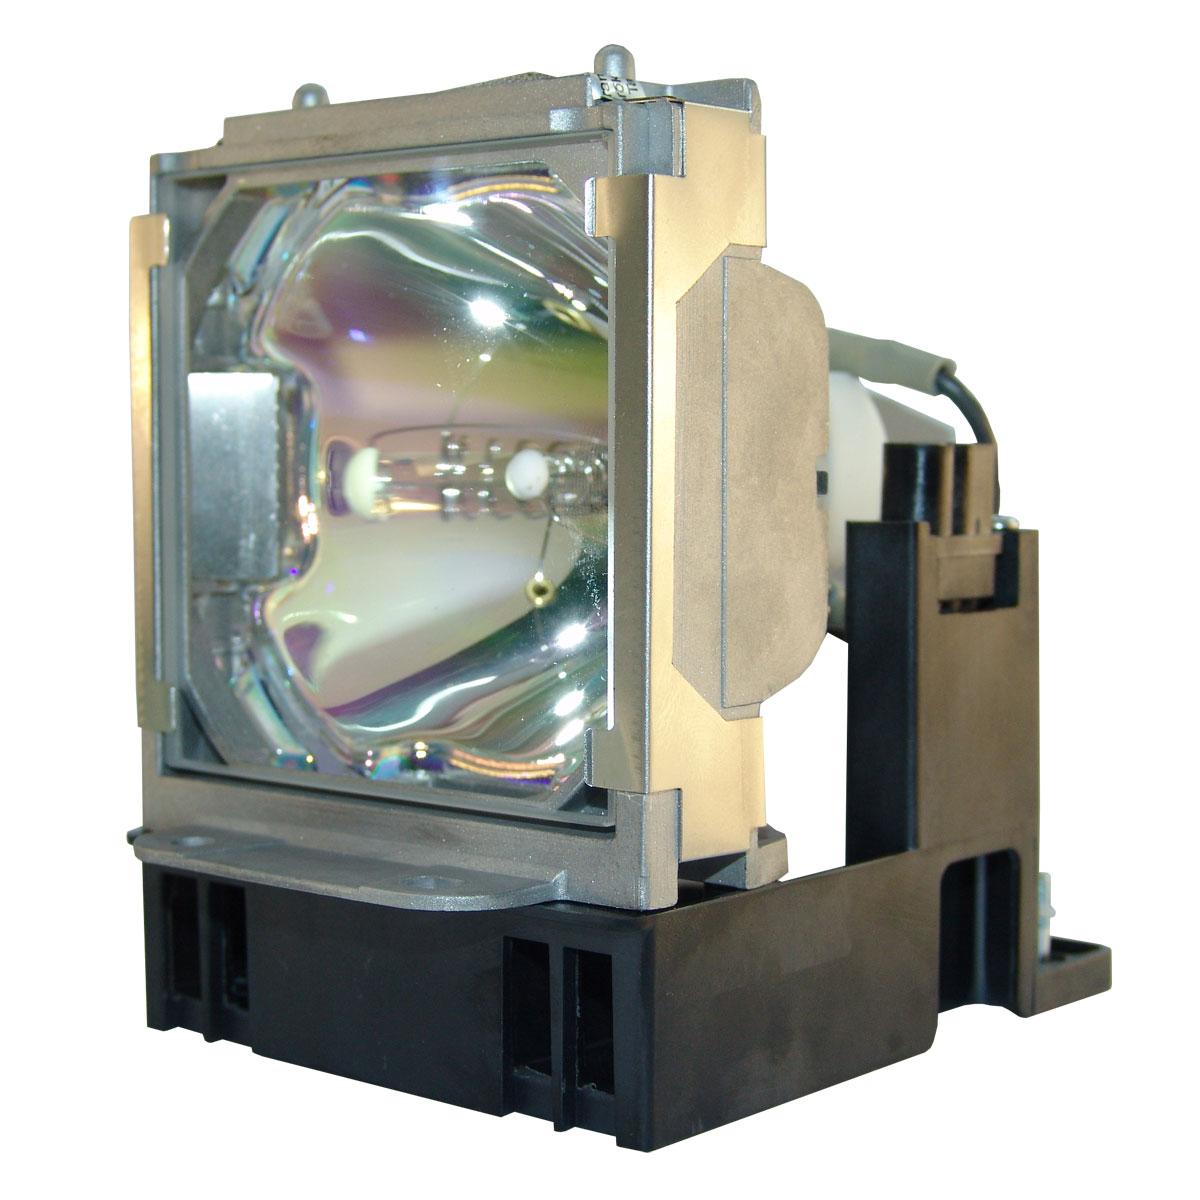 Mitsubishi Vlt Xl6600lp Vltxl6600lp Projector Lamp Housing